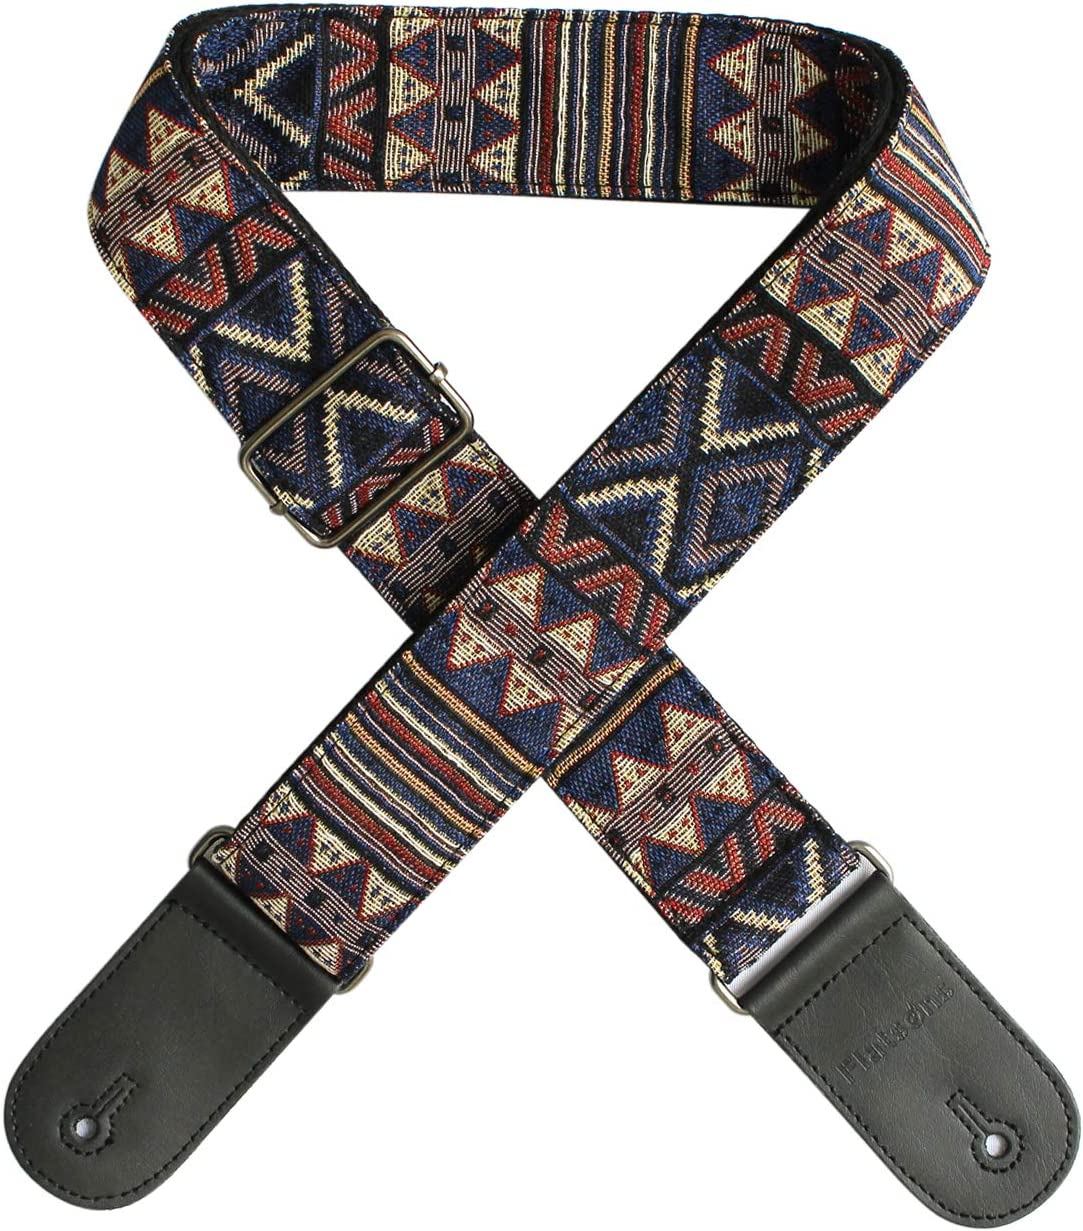 Szeles Guitar Strap 100/% Soft Cotton /& Genuine Leather Ends Guitar Shoulder Strap For Bass Electric /& Acoustic Guitars